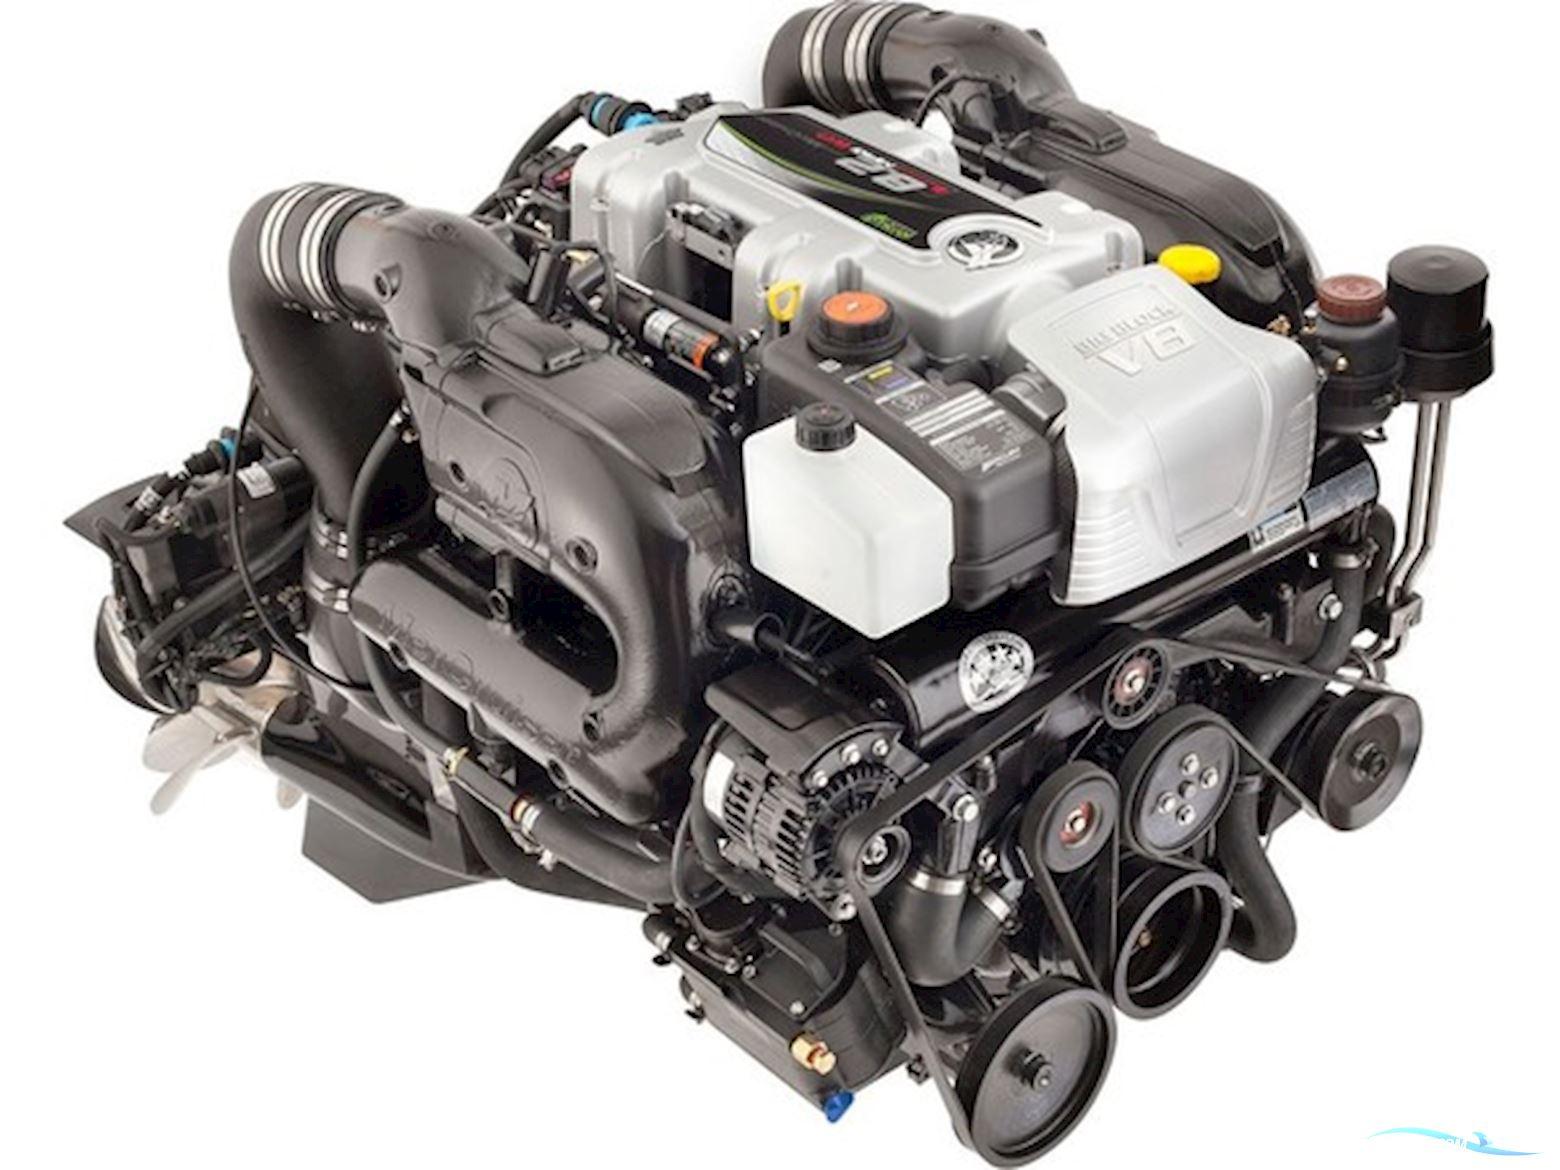 Mercruiser 8.2 Mag HO 430hk Seacore Bobtail+B Transom